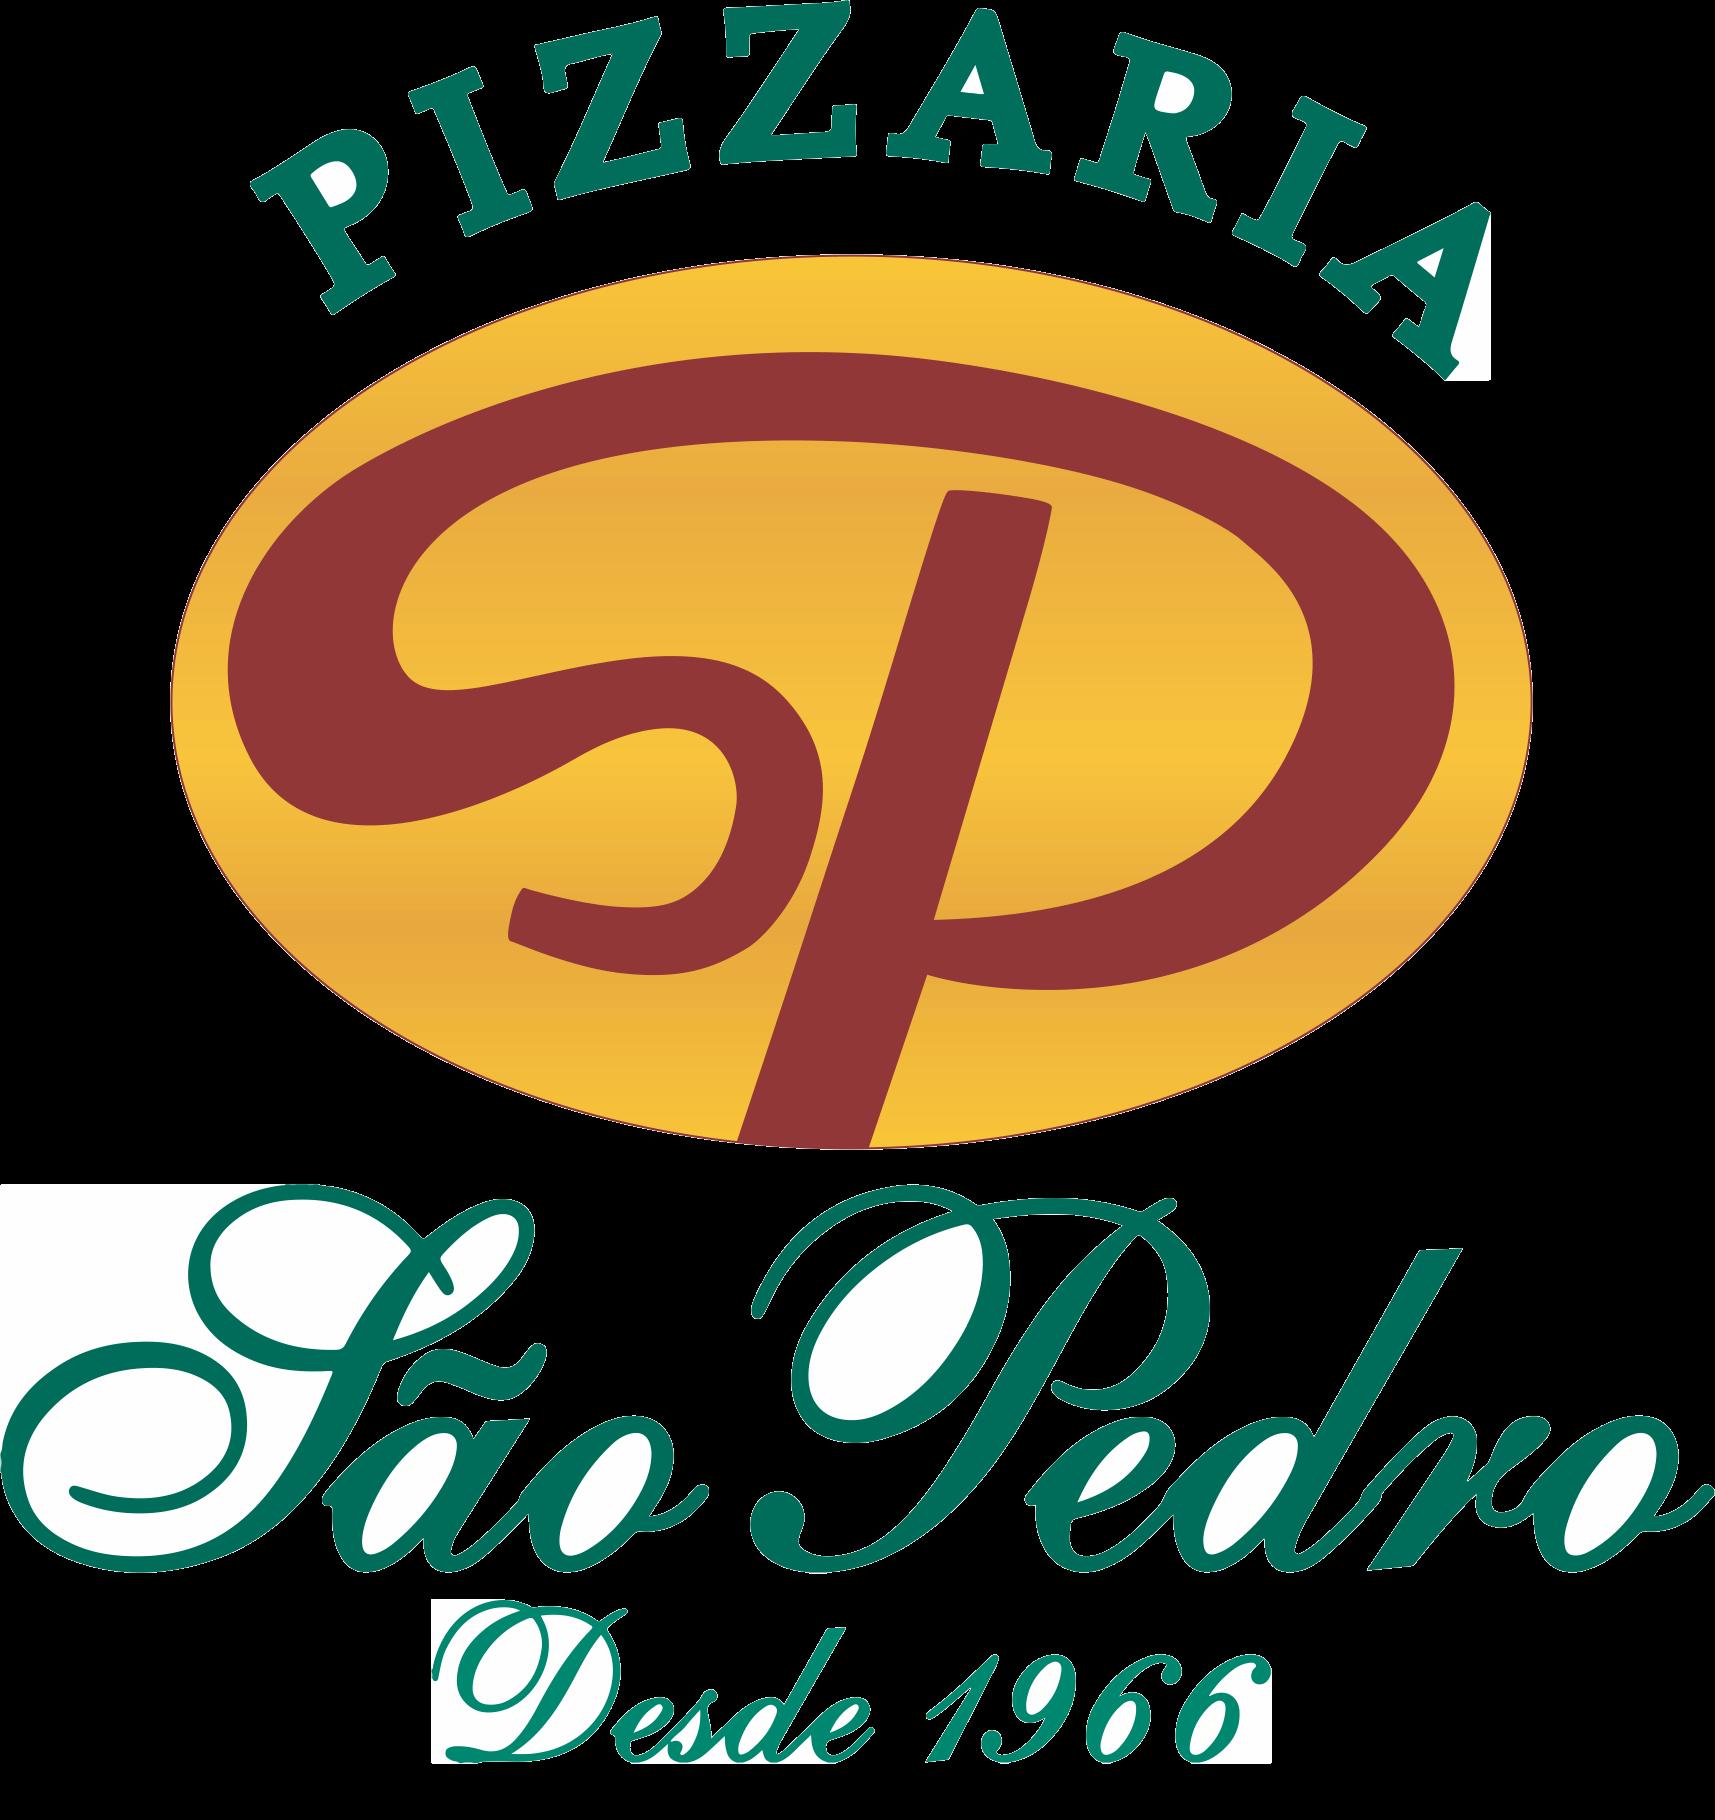 LOGO-Pizzaria-Sao-Pedro-JUVENTUS_edited.